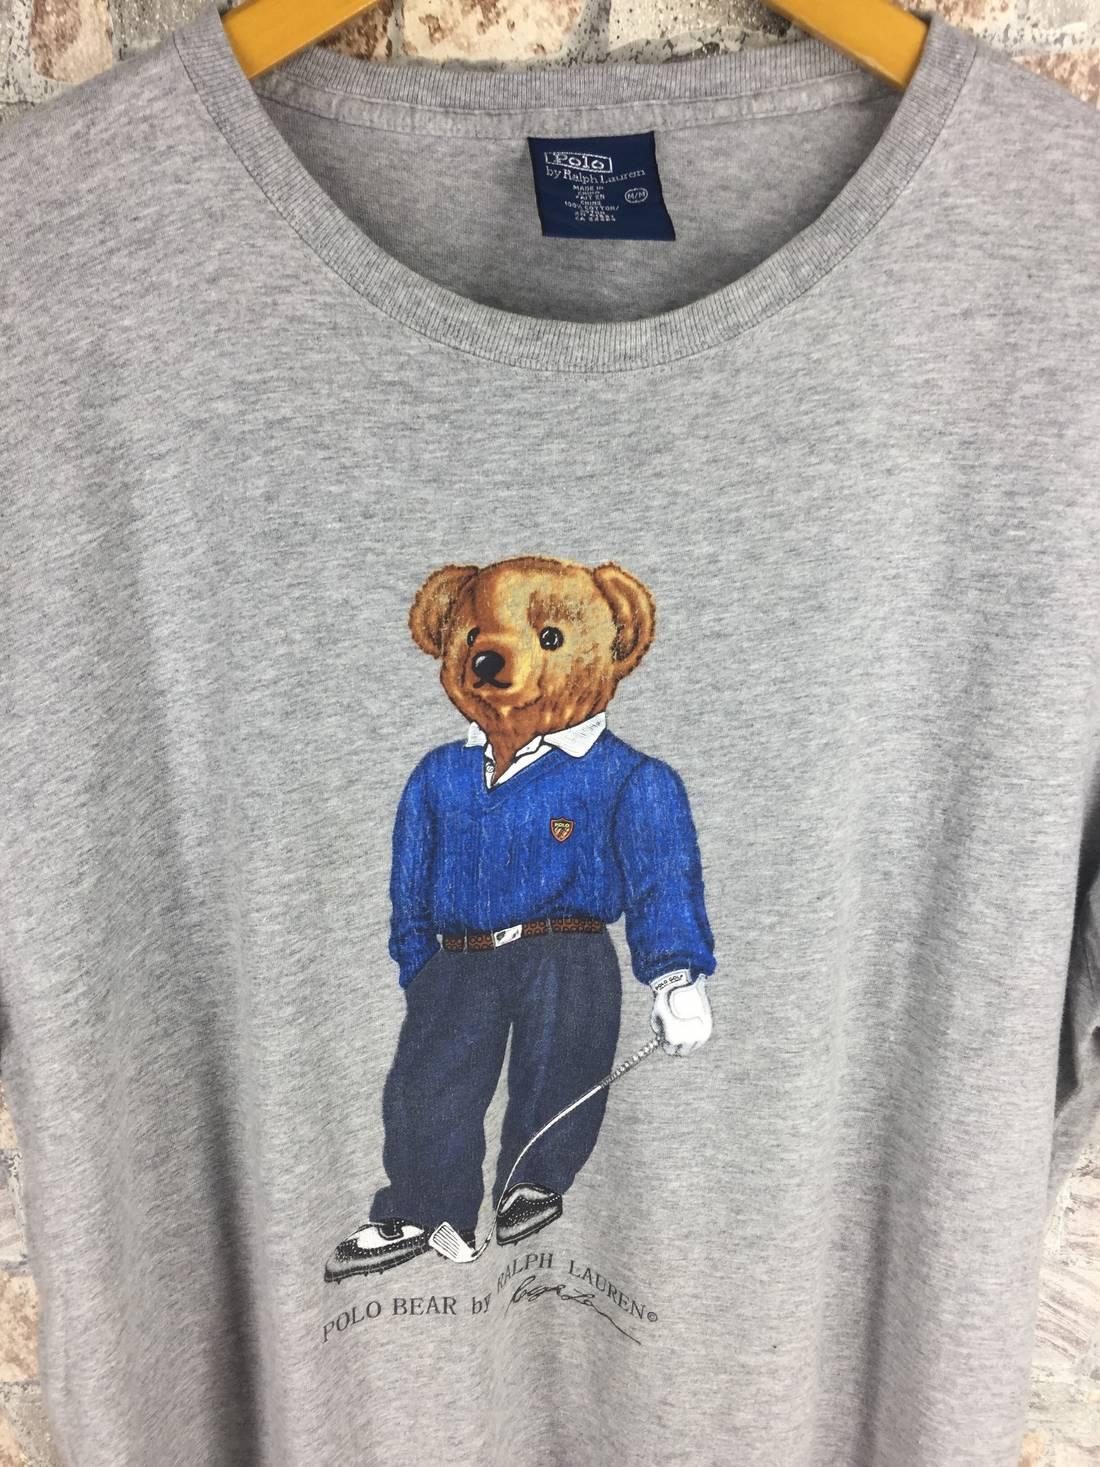 POLO BEAR T shirt Medium Polo Ralph Lauren Vintage 90s Polo Sport Usa Bear  Play Golf 48bd4a04cdb